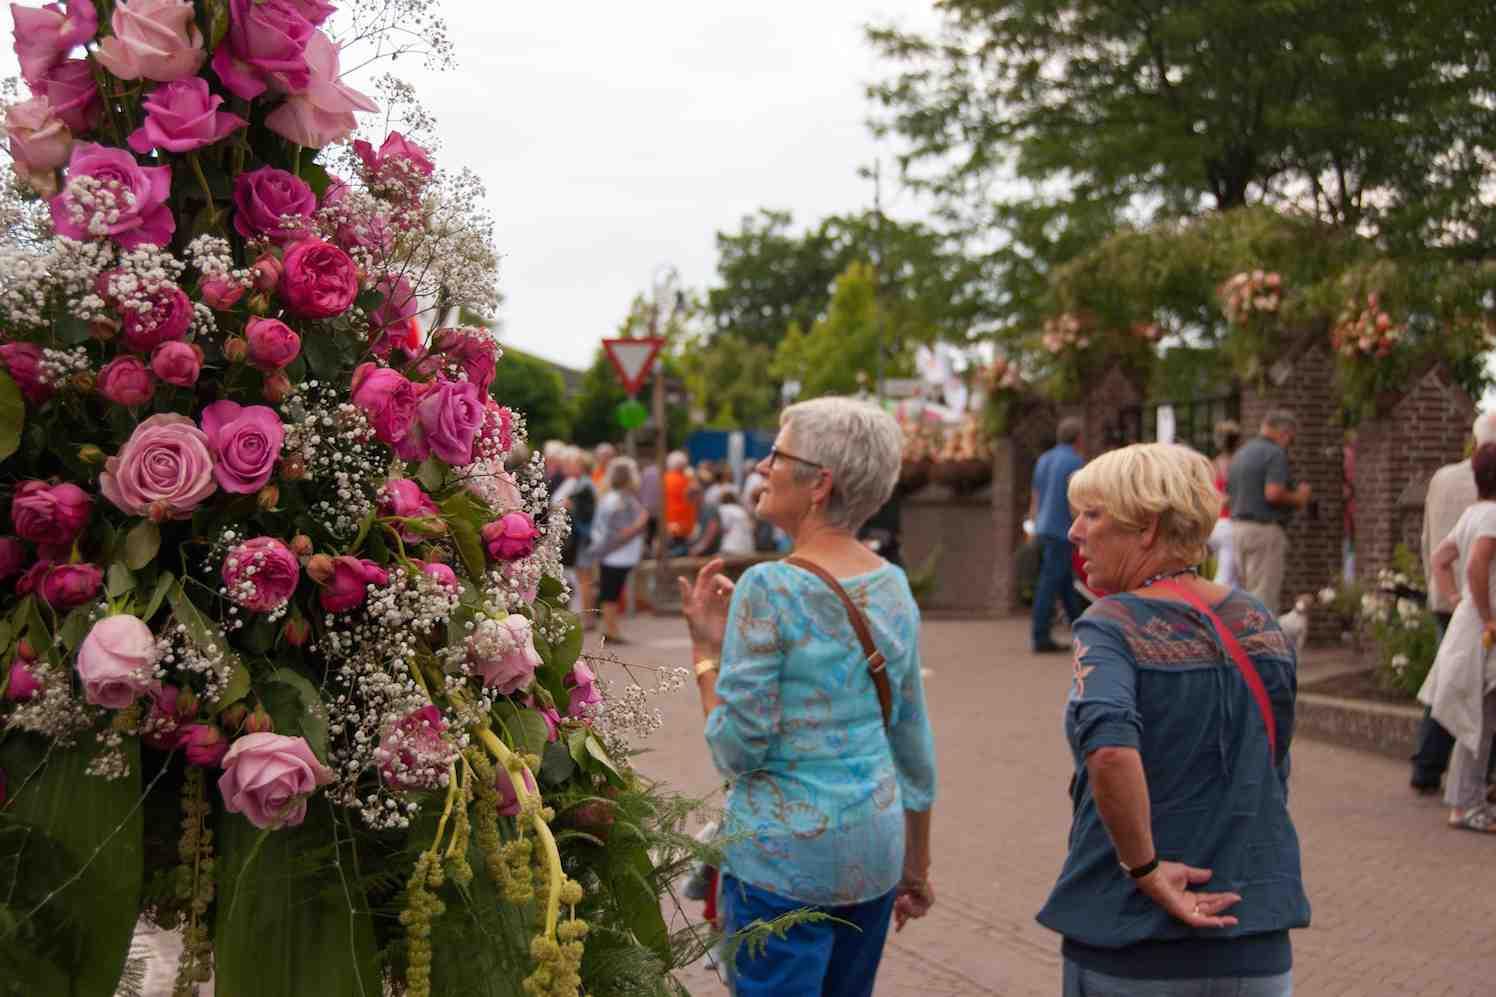 jubileum rozenfestival in Lottum